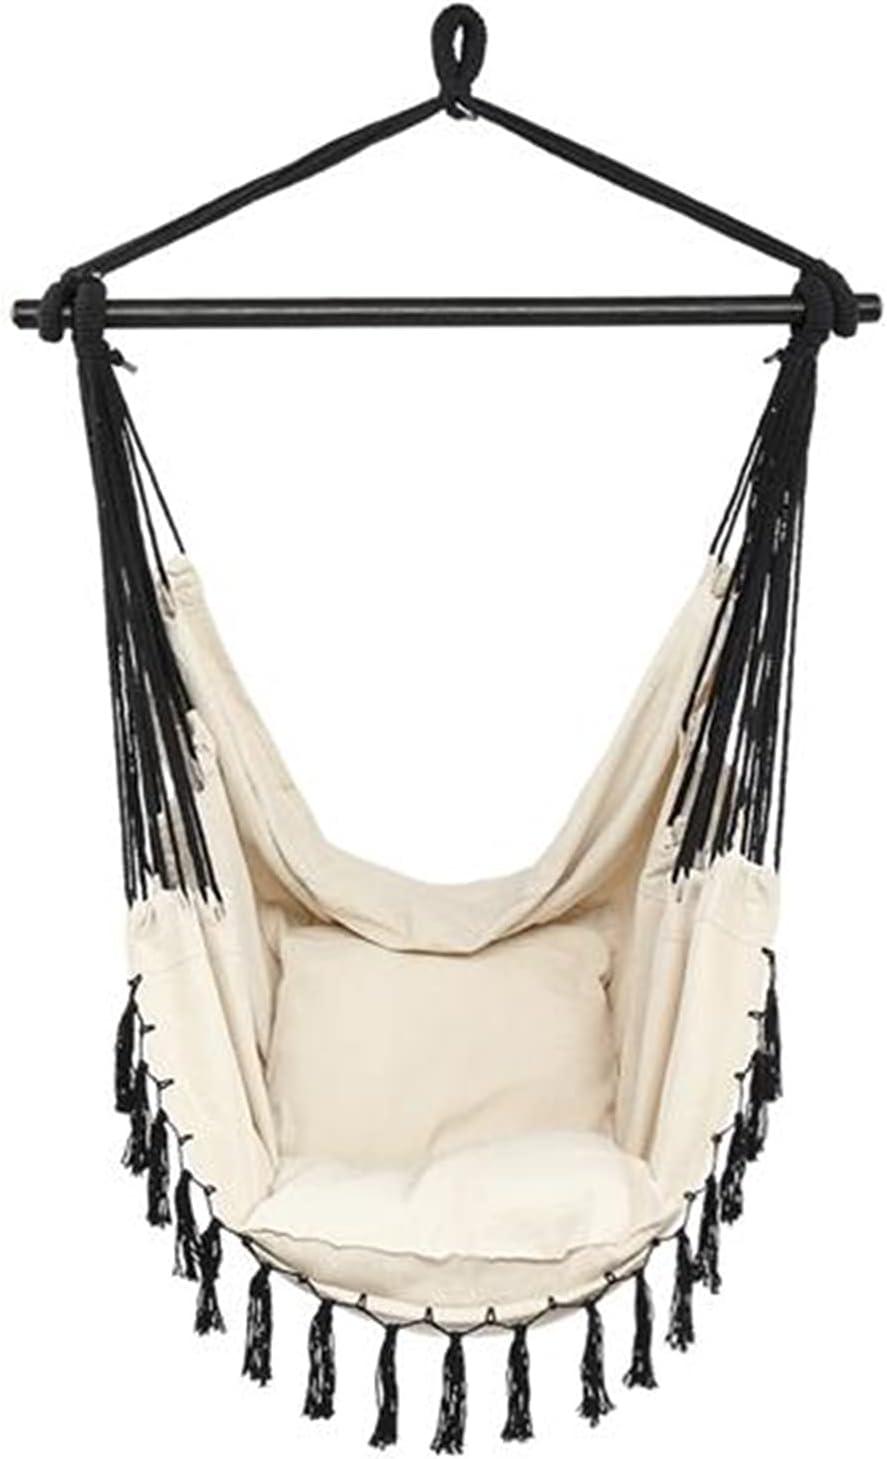 Hammock Chair Swing Tucson Mall Sale Hanging Livingroom Ma Indoor